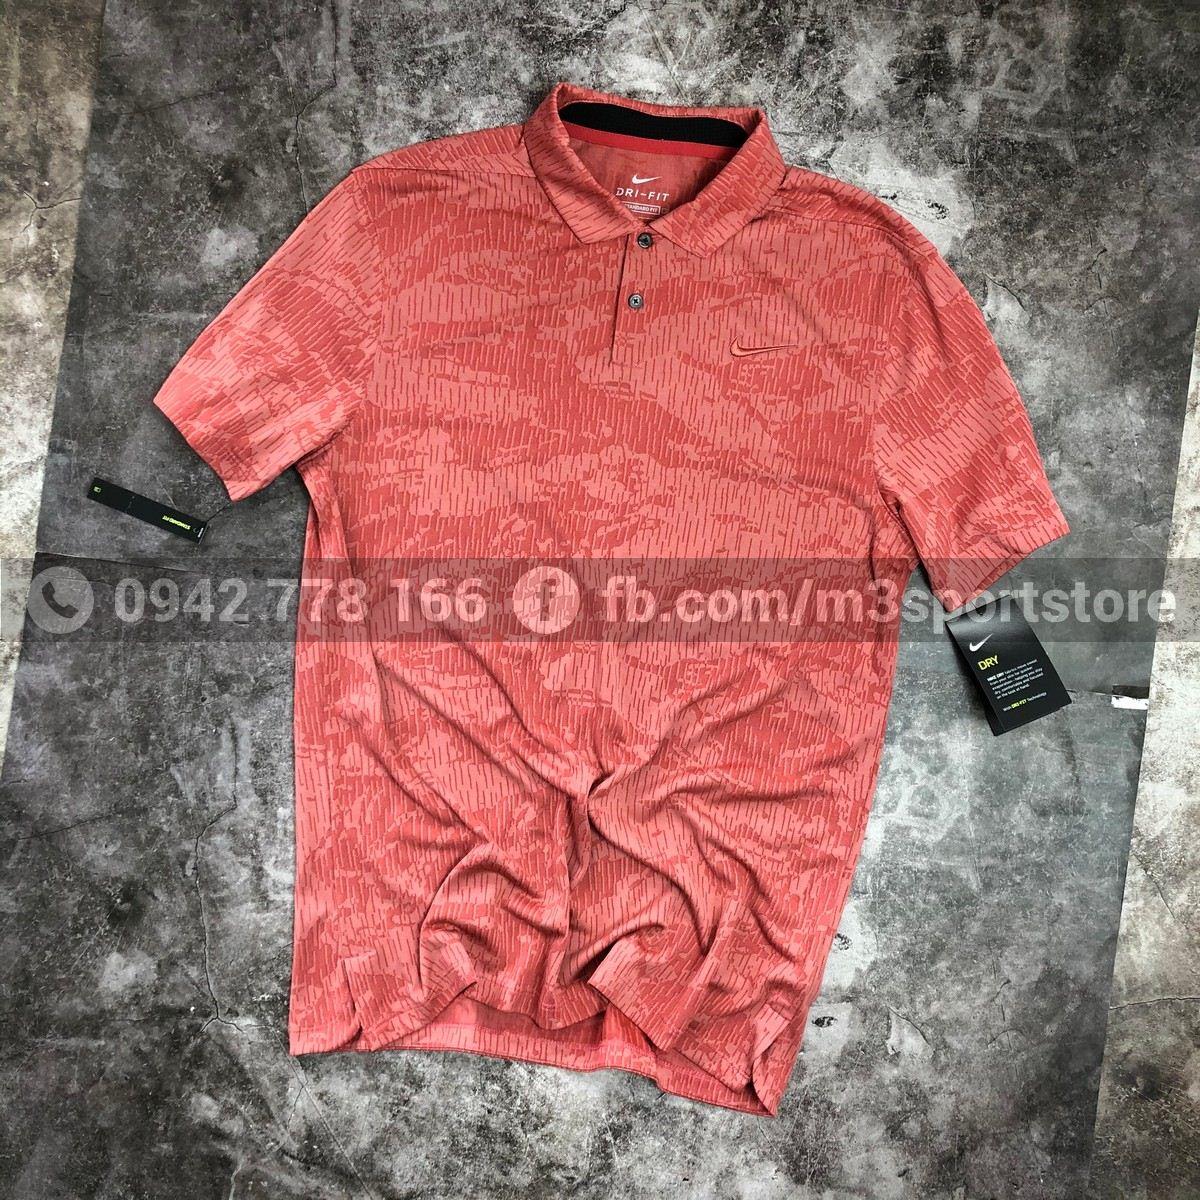 Áo thể thao nam Nike golf Polo Dri-Fit Vapor Camo BV0479